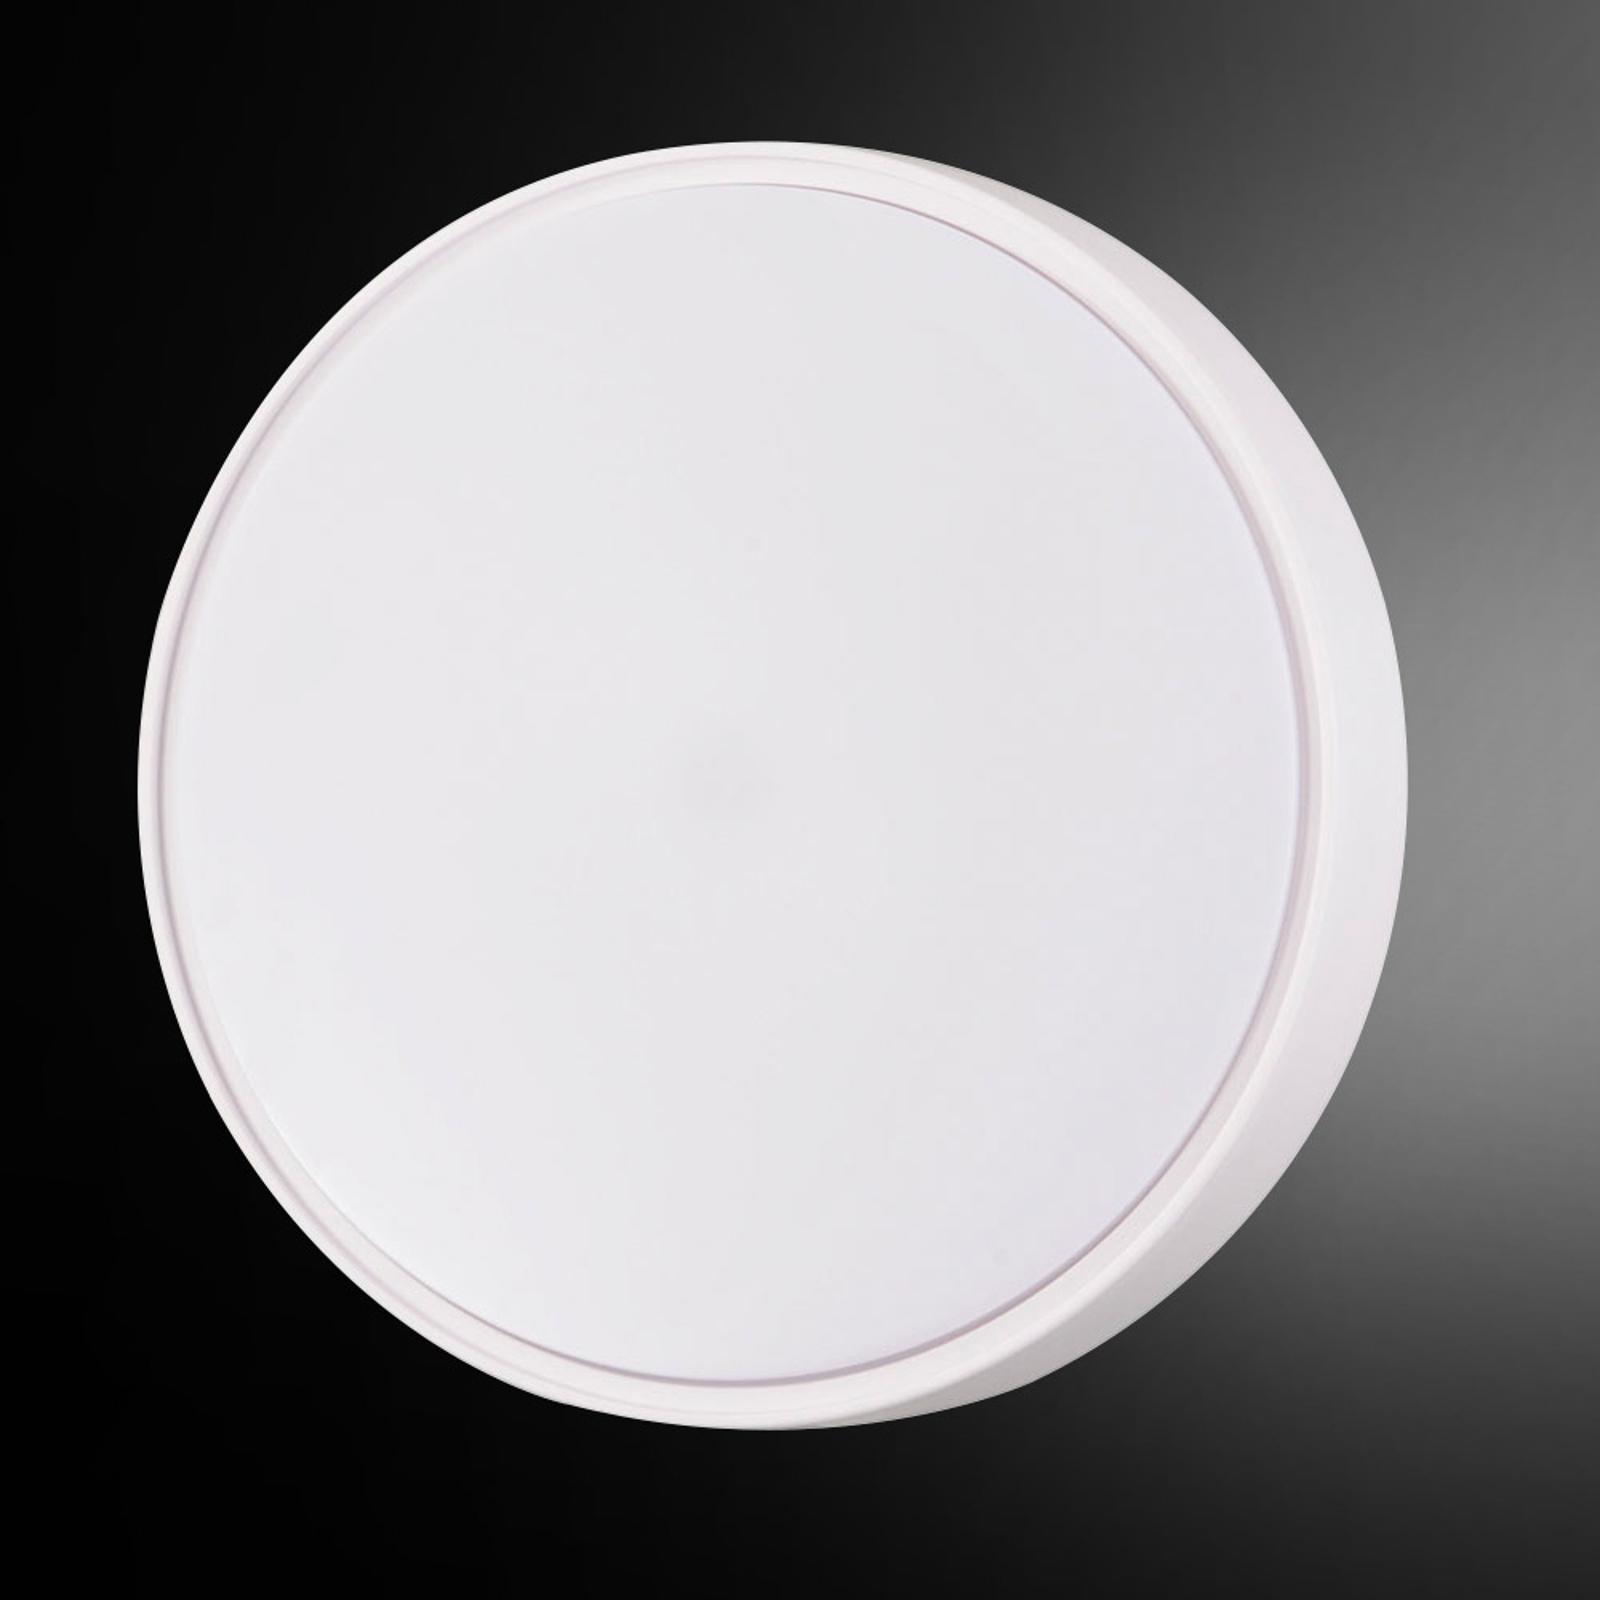 Hatton LED Ceiling Light Bright IP65 30 cm_3502458_1